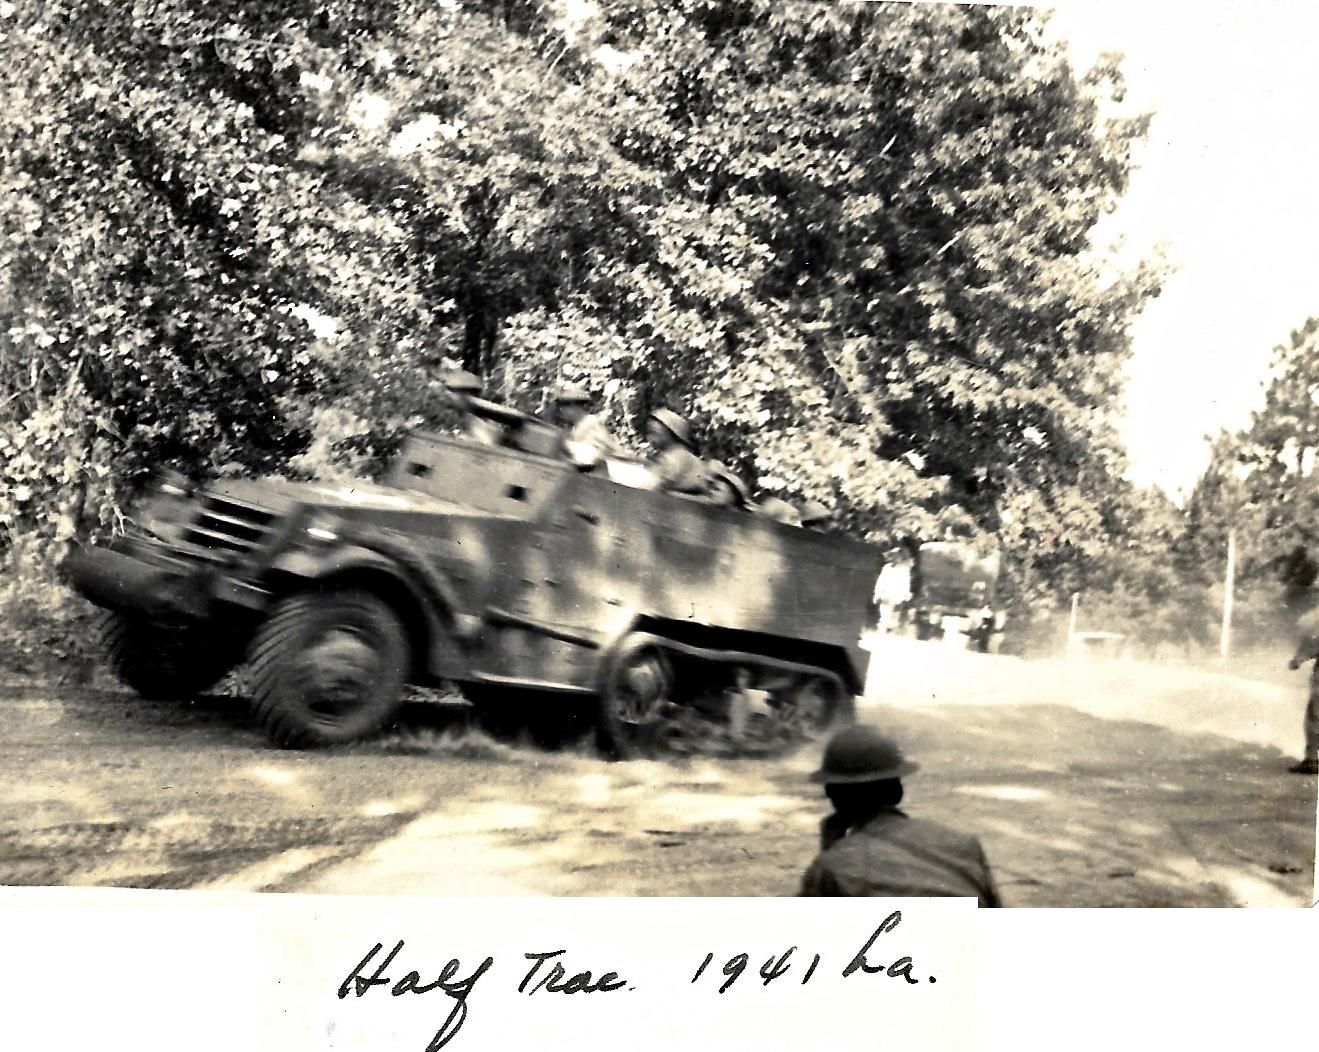 1941 WWII Louisiana Maneuvers, Half Trac